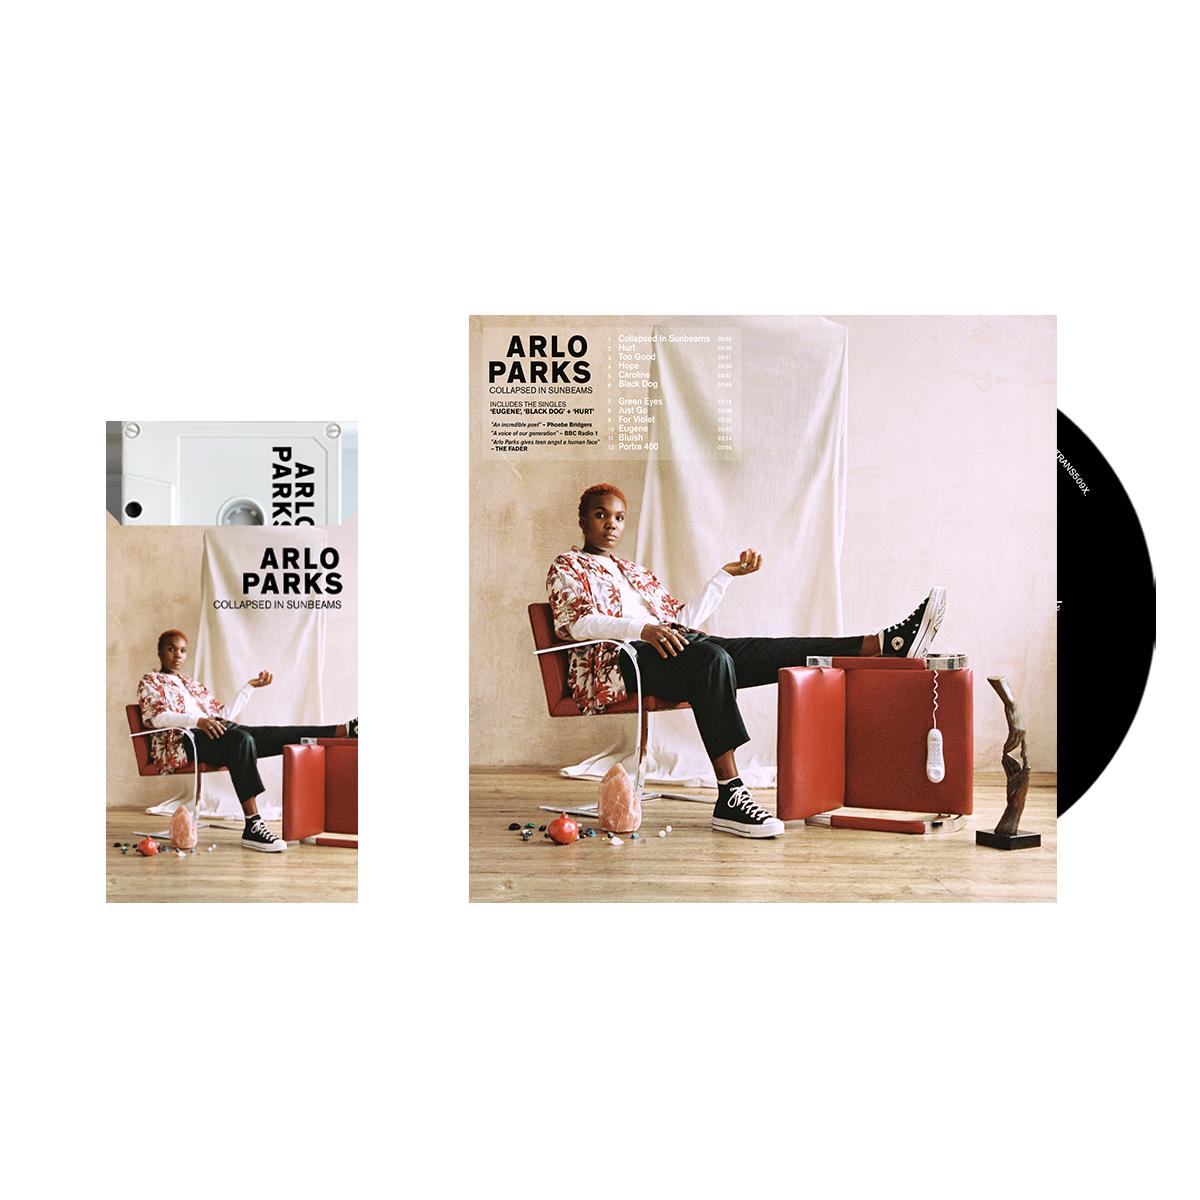 Buy Online Arlo Parks - CD (Signed) + Cassette + Bonus CD Best Of The Lo Fi Lounge (signed) + Flexi-disk